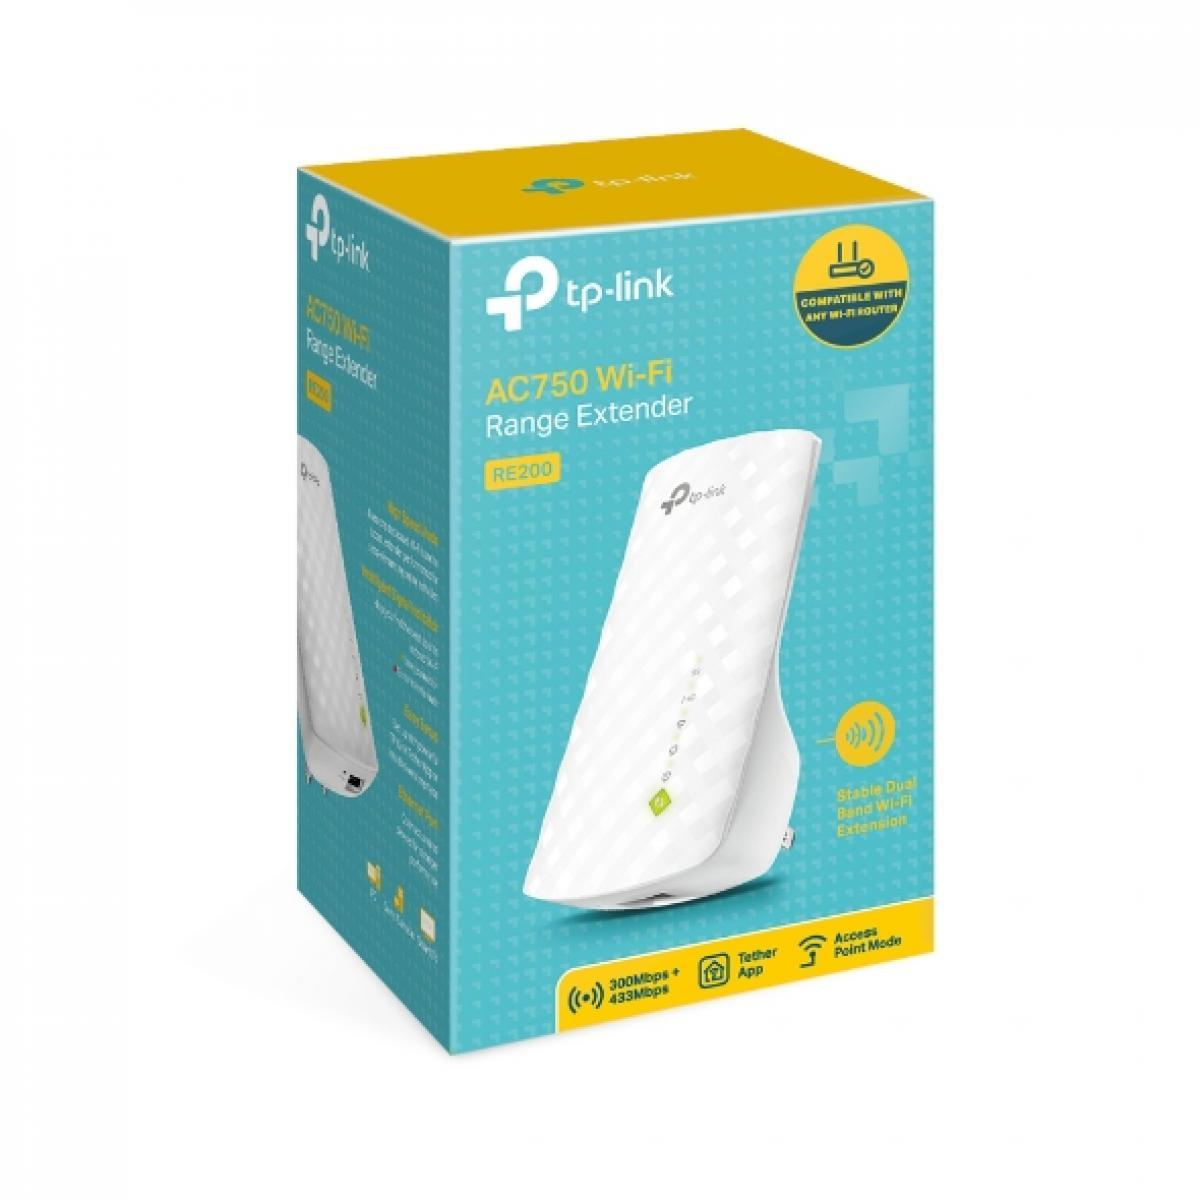 TP-LINK AC750 Wi-Fi Range Extender RE200